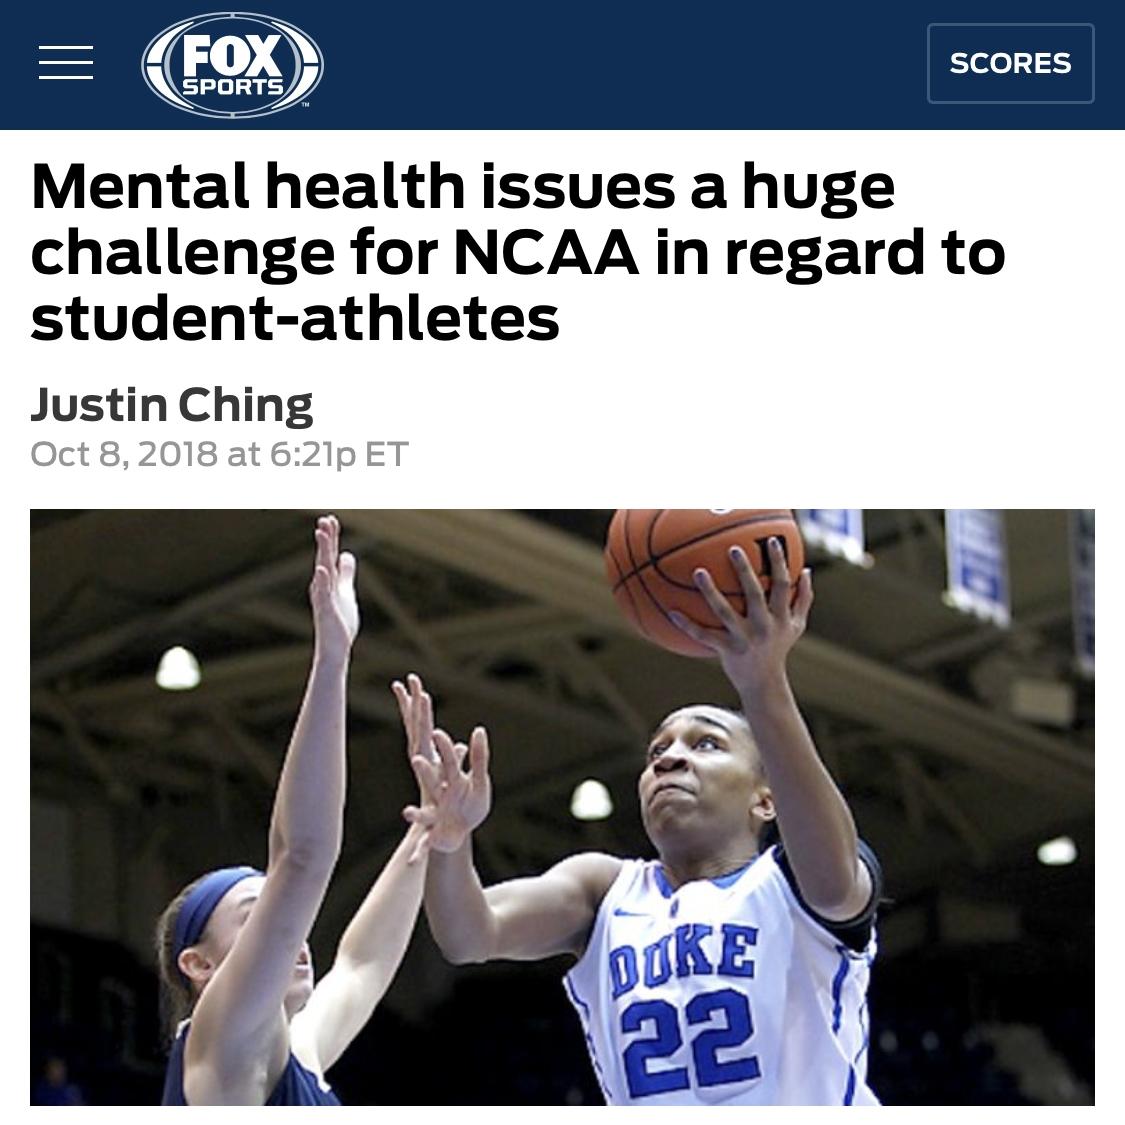 Fox Sports Article 1.jpg